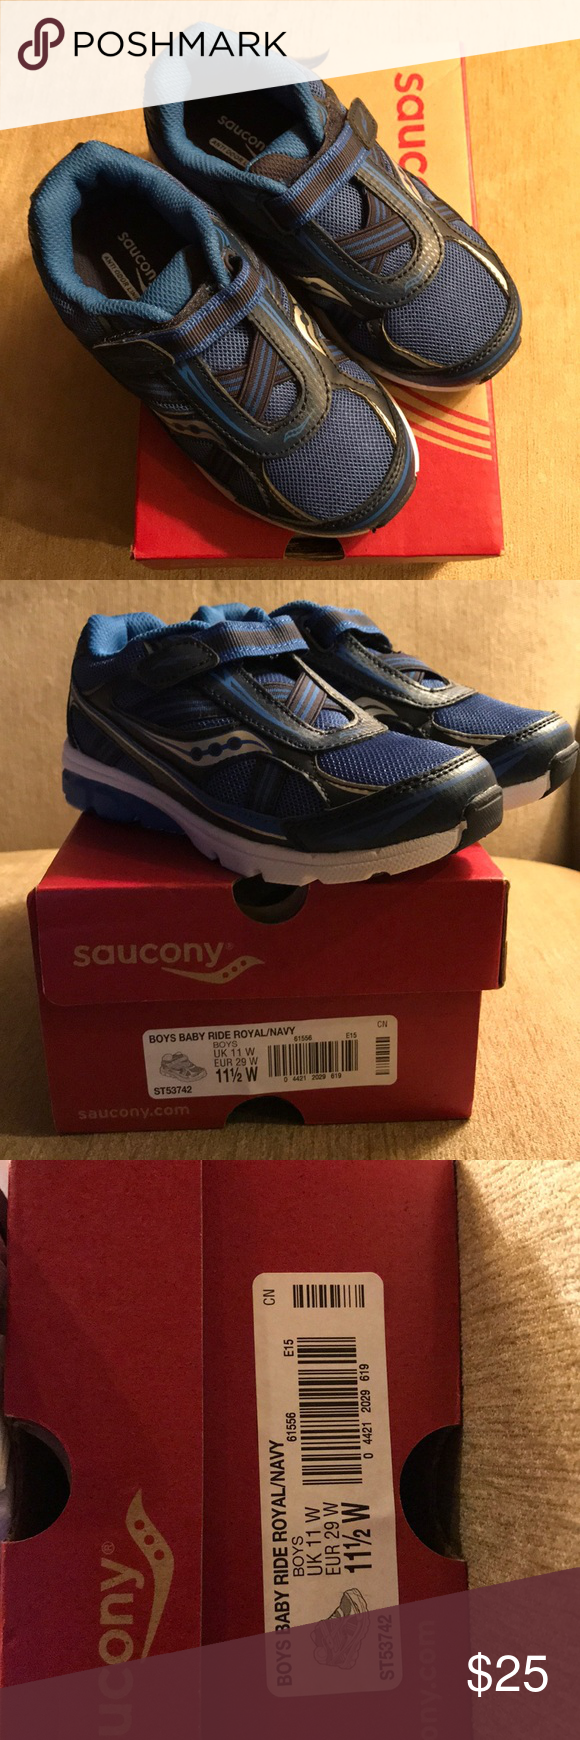 eed628872c Saucony Boys Baby Ride Wide Sneakers Brand New Saucony Boys Baby ...